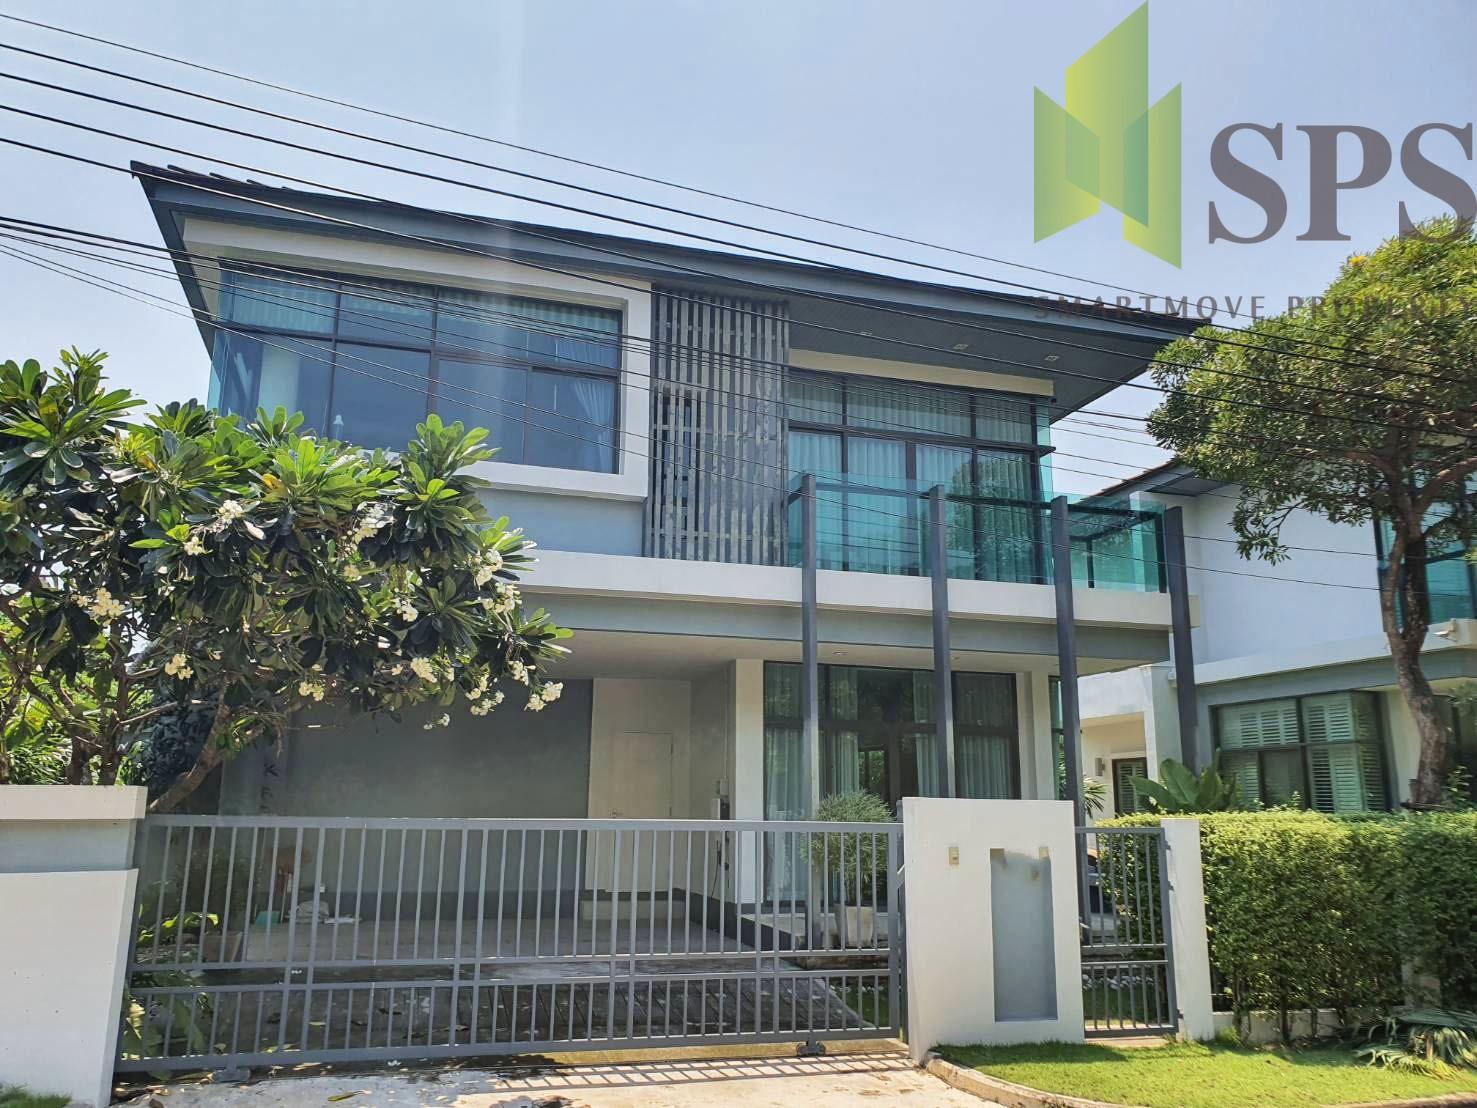 Single house Setthai Krungthepkretha Soi 7 บ้านให้เช่าโครงการเศรษฐสิริกรุงเทพกรีฑา ซอย 7 ( SPSPE257)